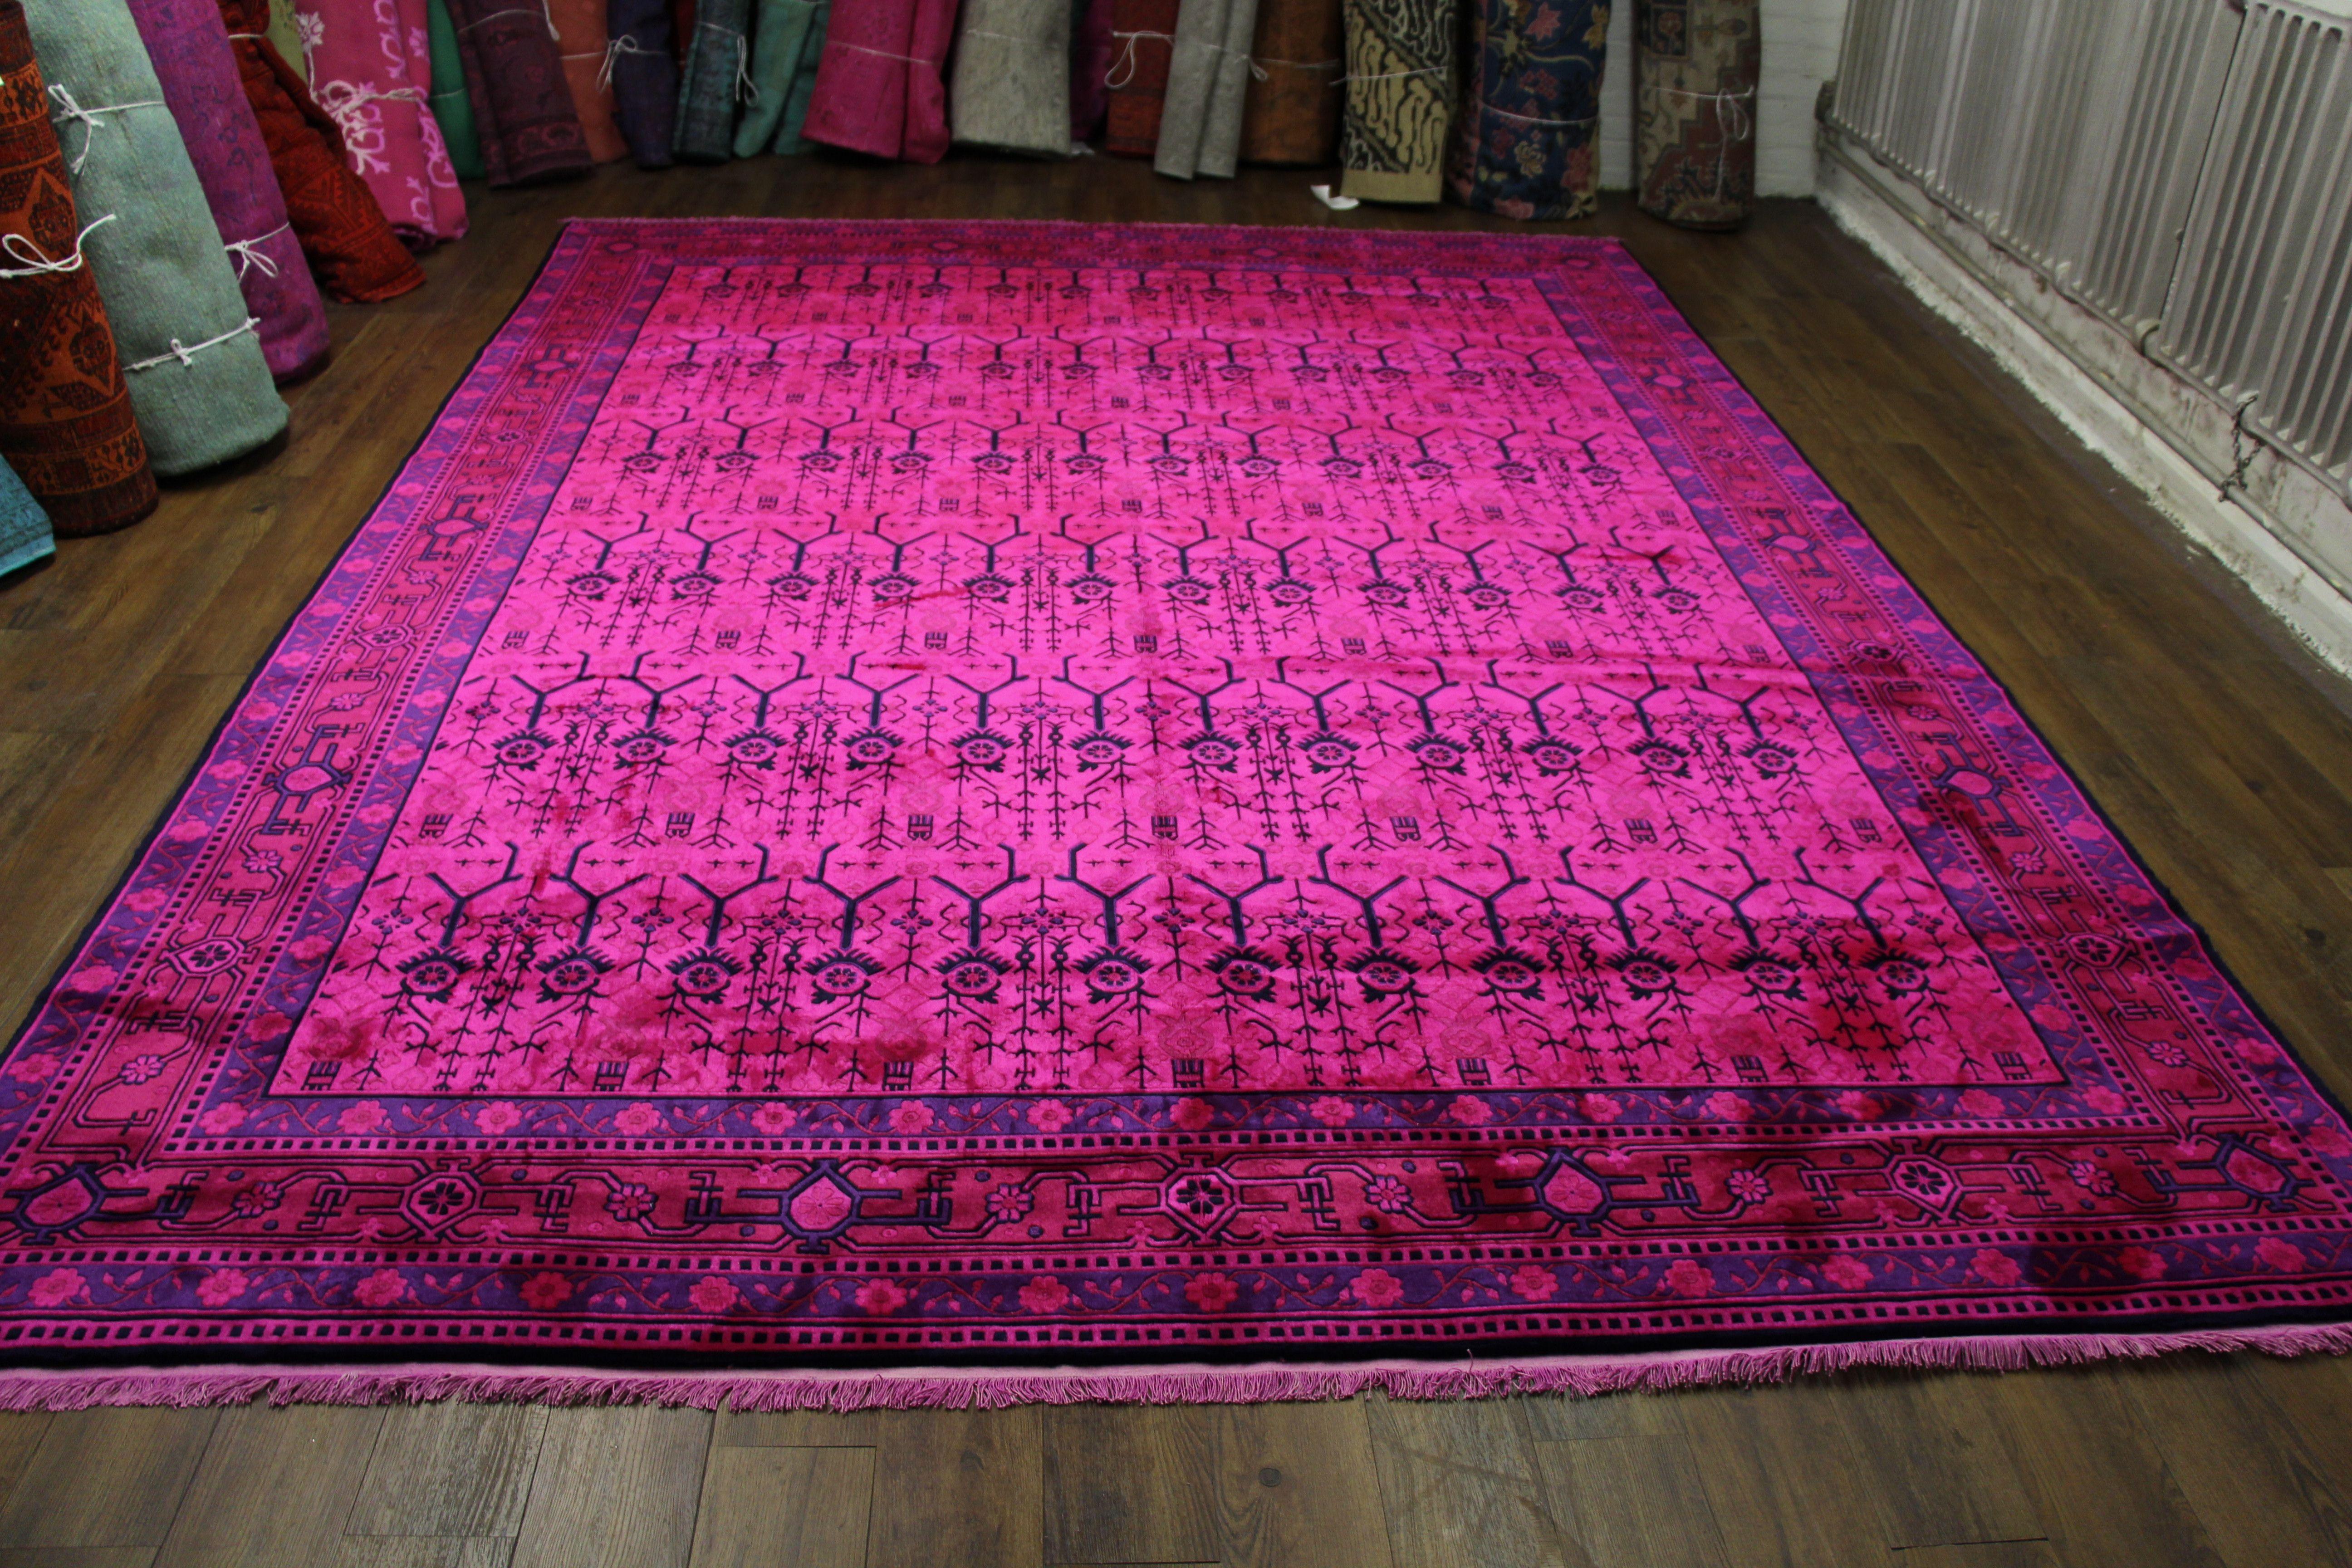 9x12 Hot Pink Rug Overdyed Chinese Art Deco 2719. Amazing